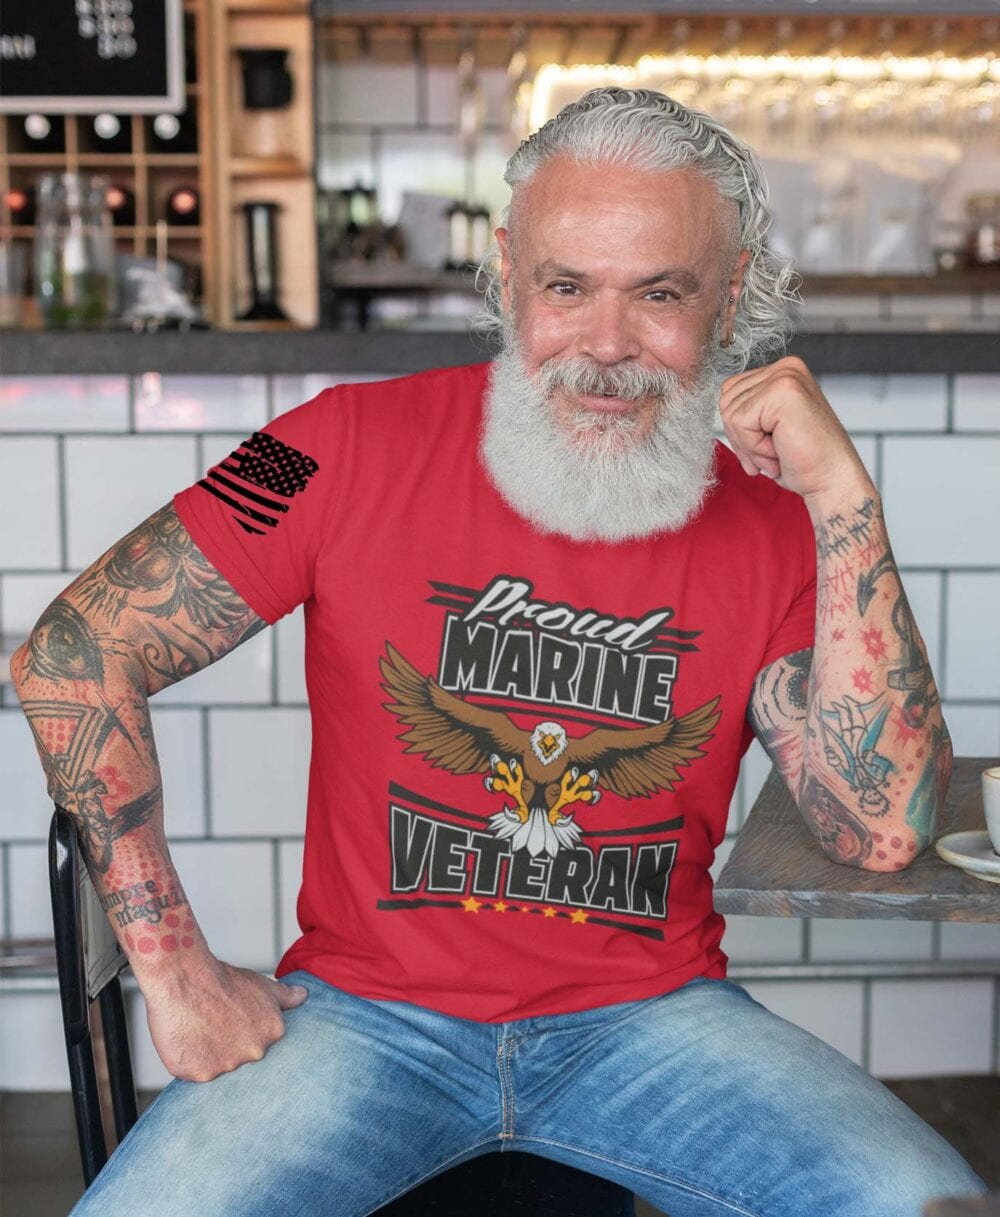 Marine Veteran on Men's Red Tshirt